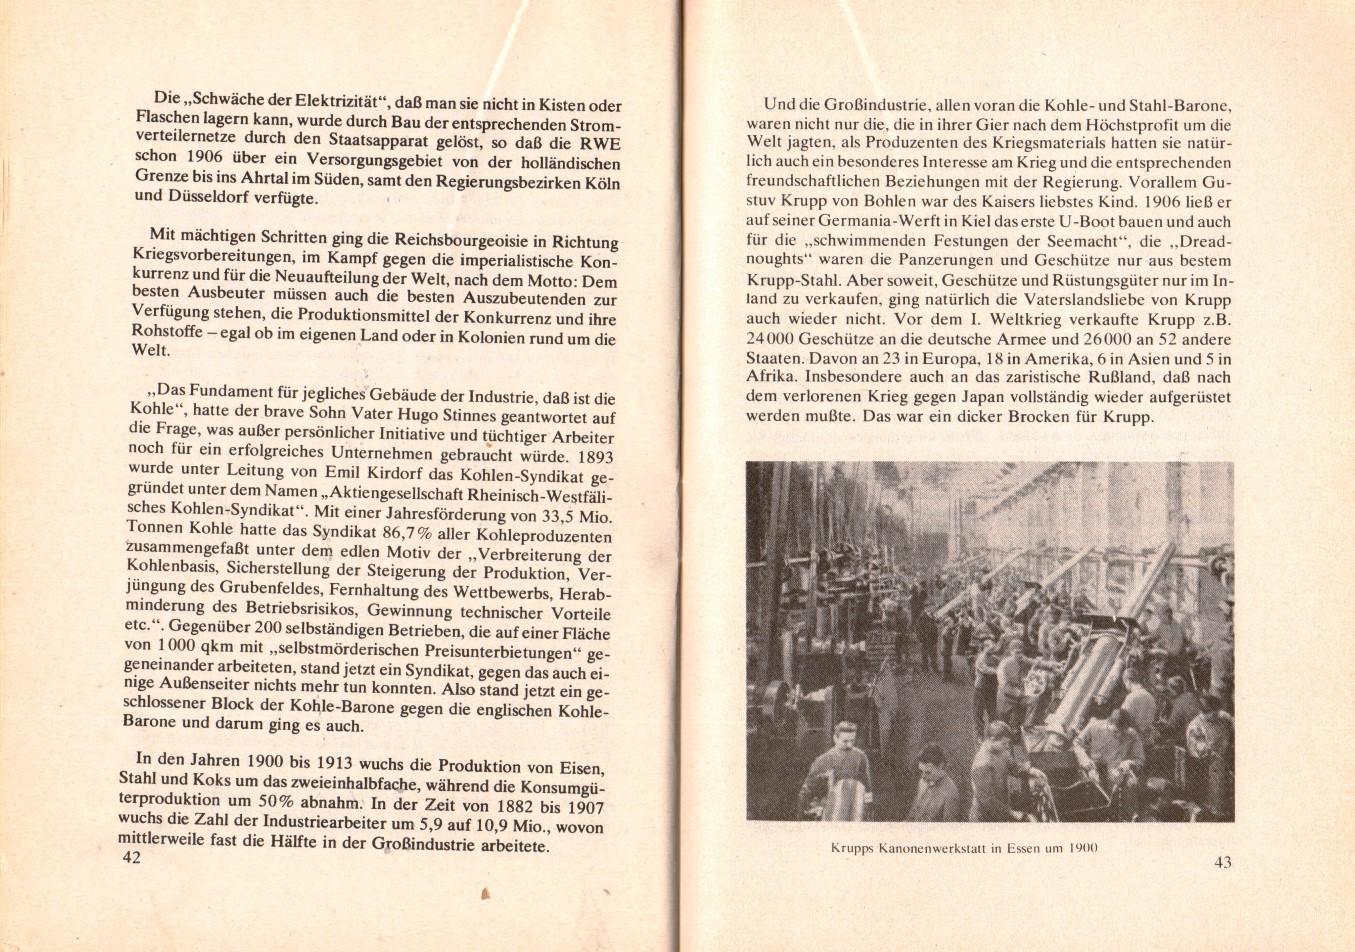 NRW_KBW_1977_Politik_der_Kohle_u_Stahlbarone_23